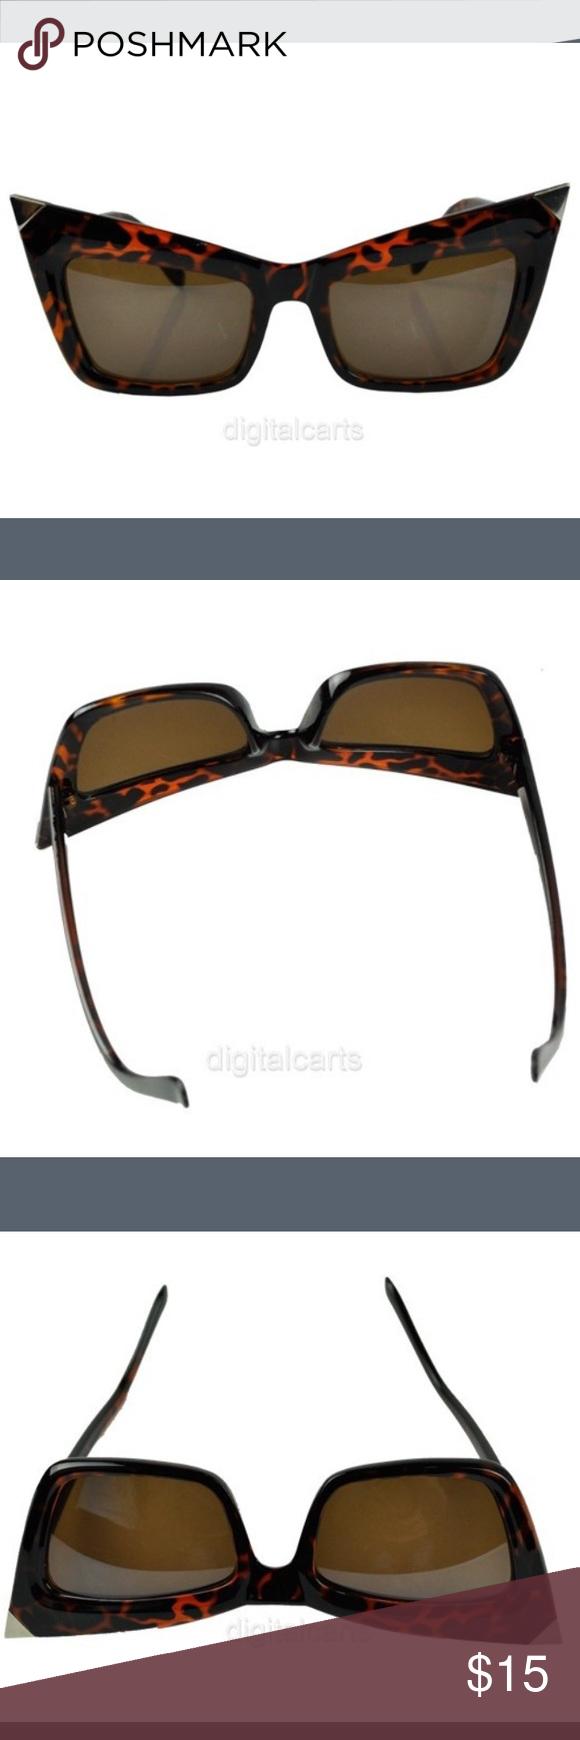 Designer  Cat Eye Sunglasses 100% Brand New Weight: 31.2g Leopard Print Size: 15 x 5(LxW) cm Accessories Sunglasses